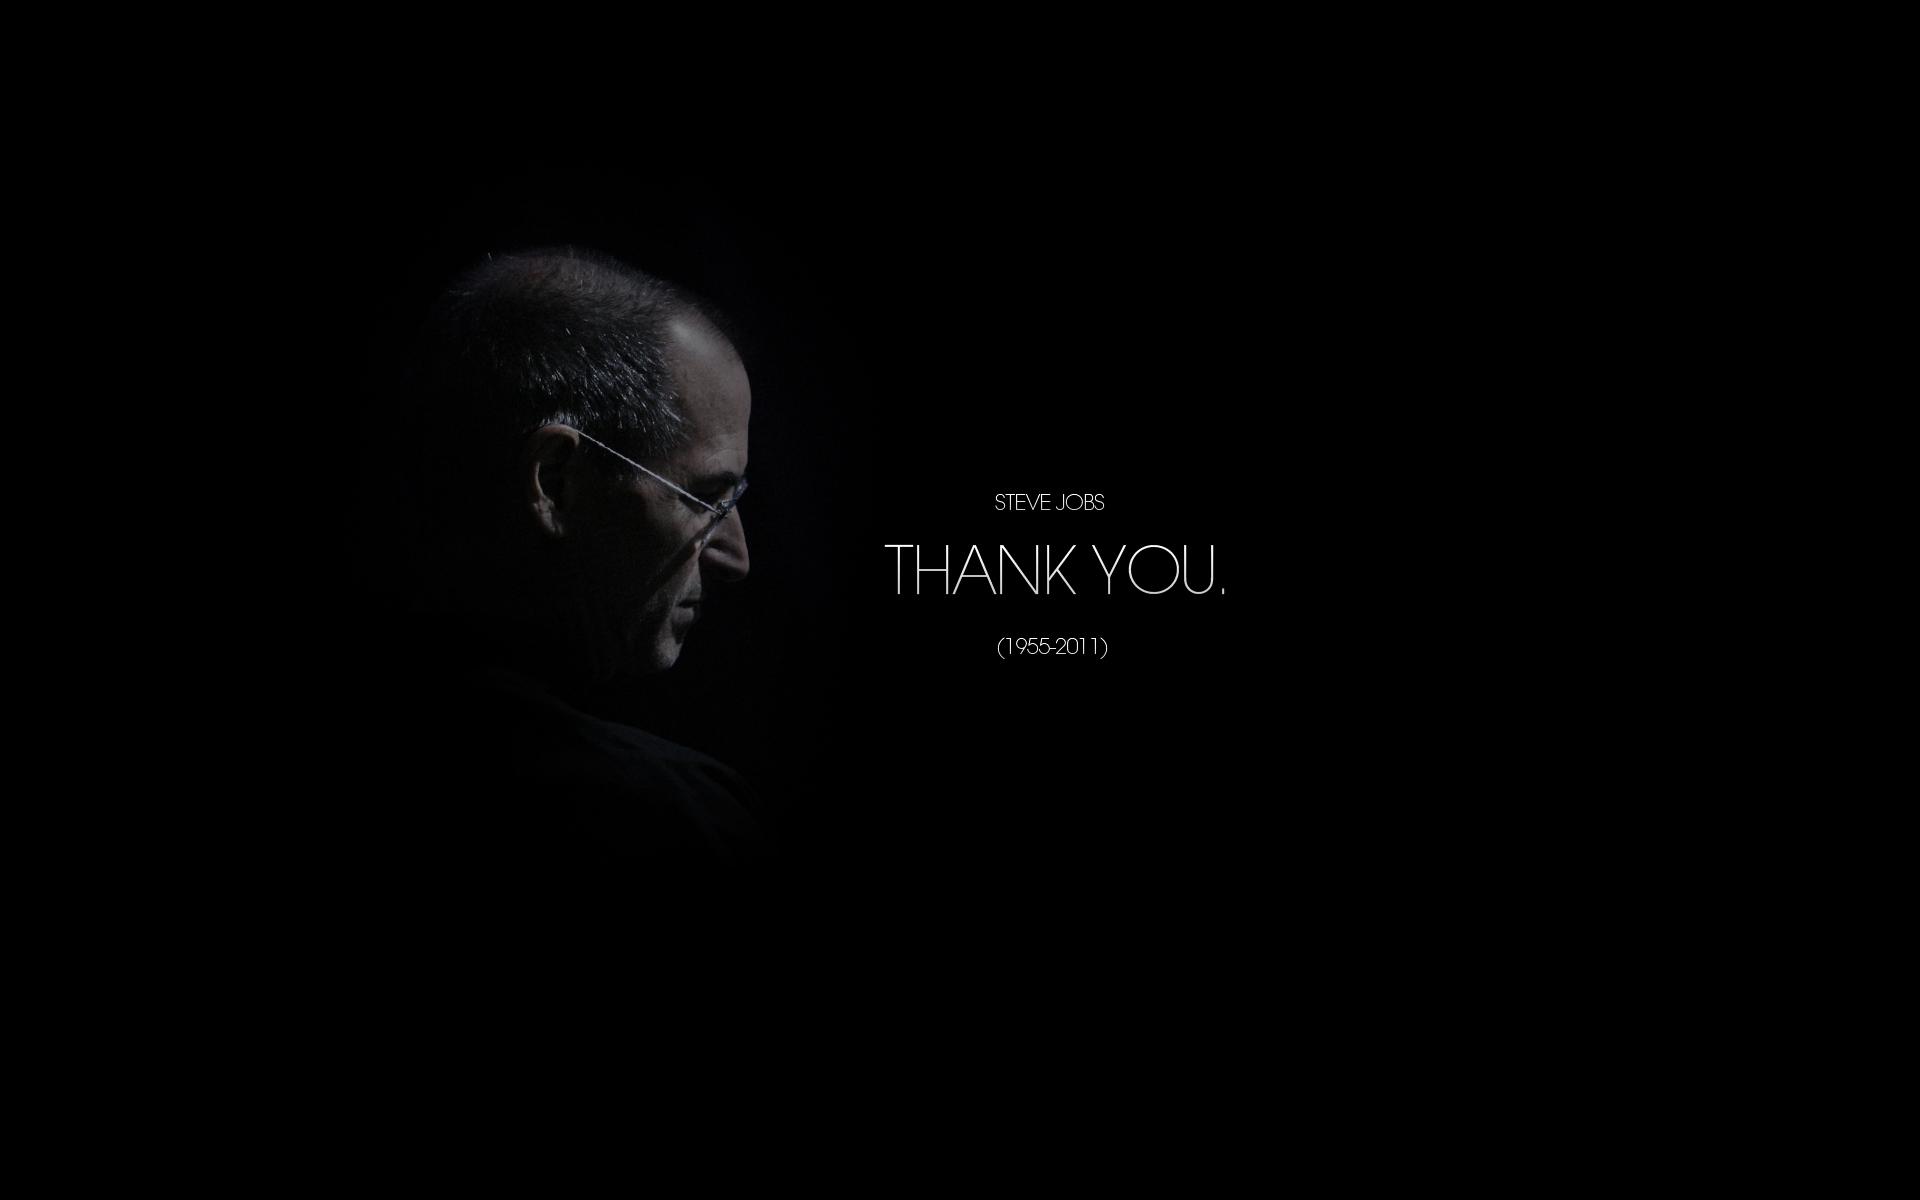 RIP Steve Jobs By IshaanMishra